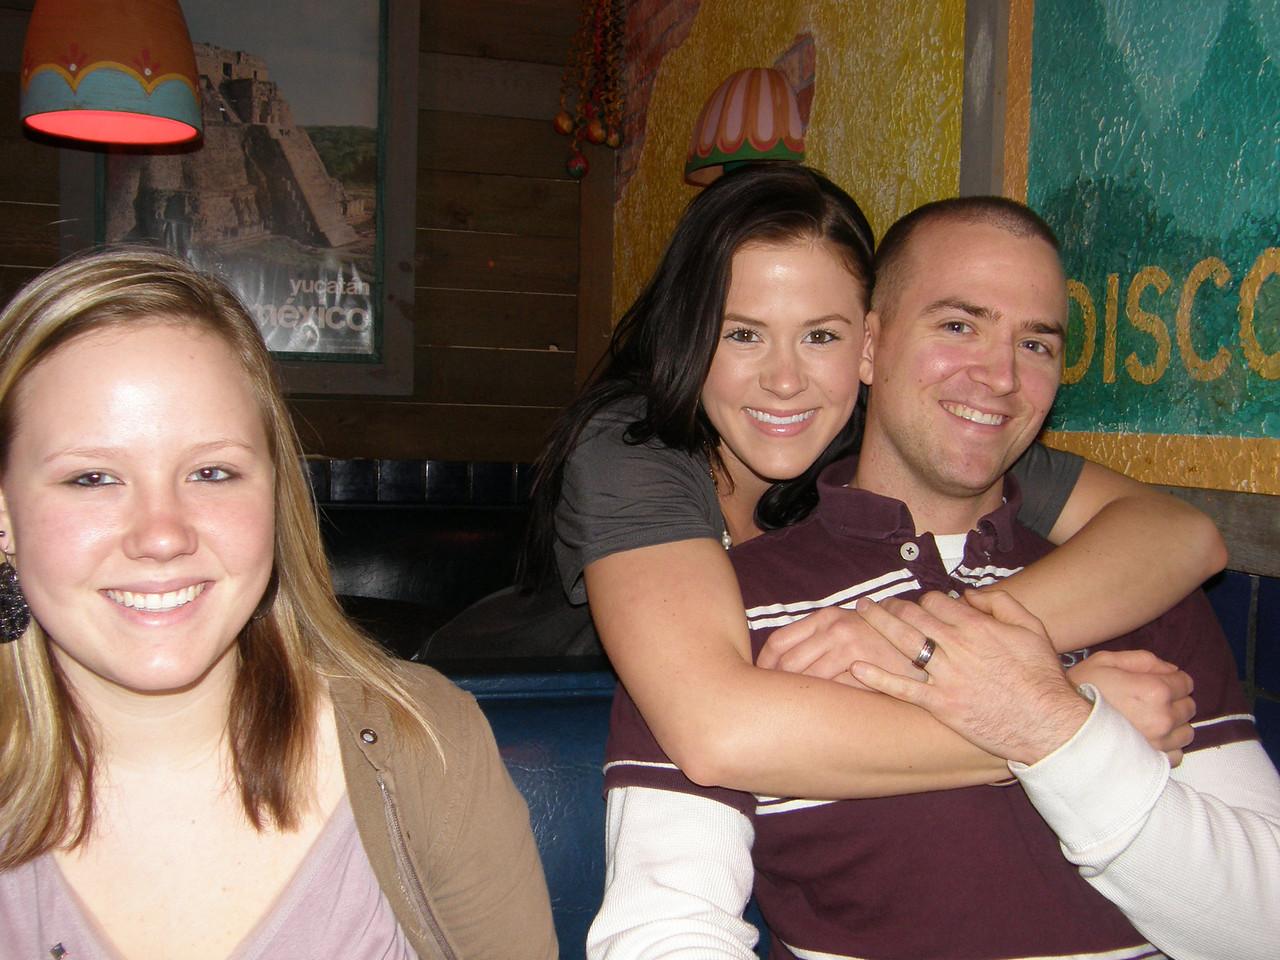 Katie, Sarah, and Luke Casa Ole!